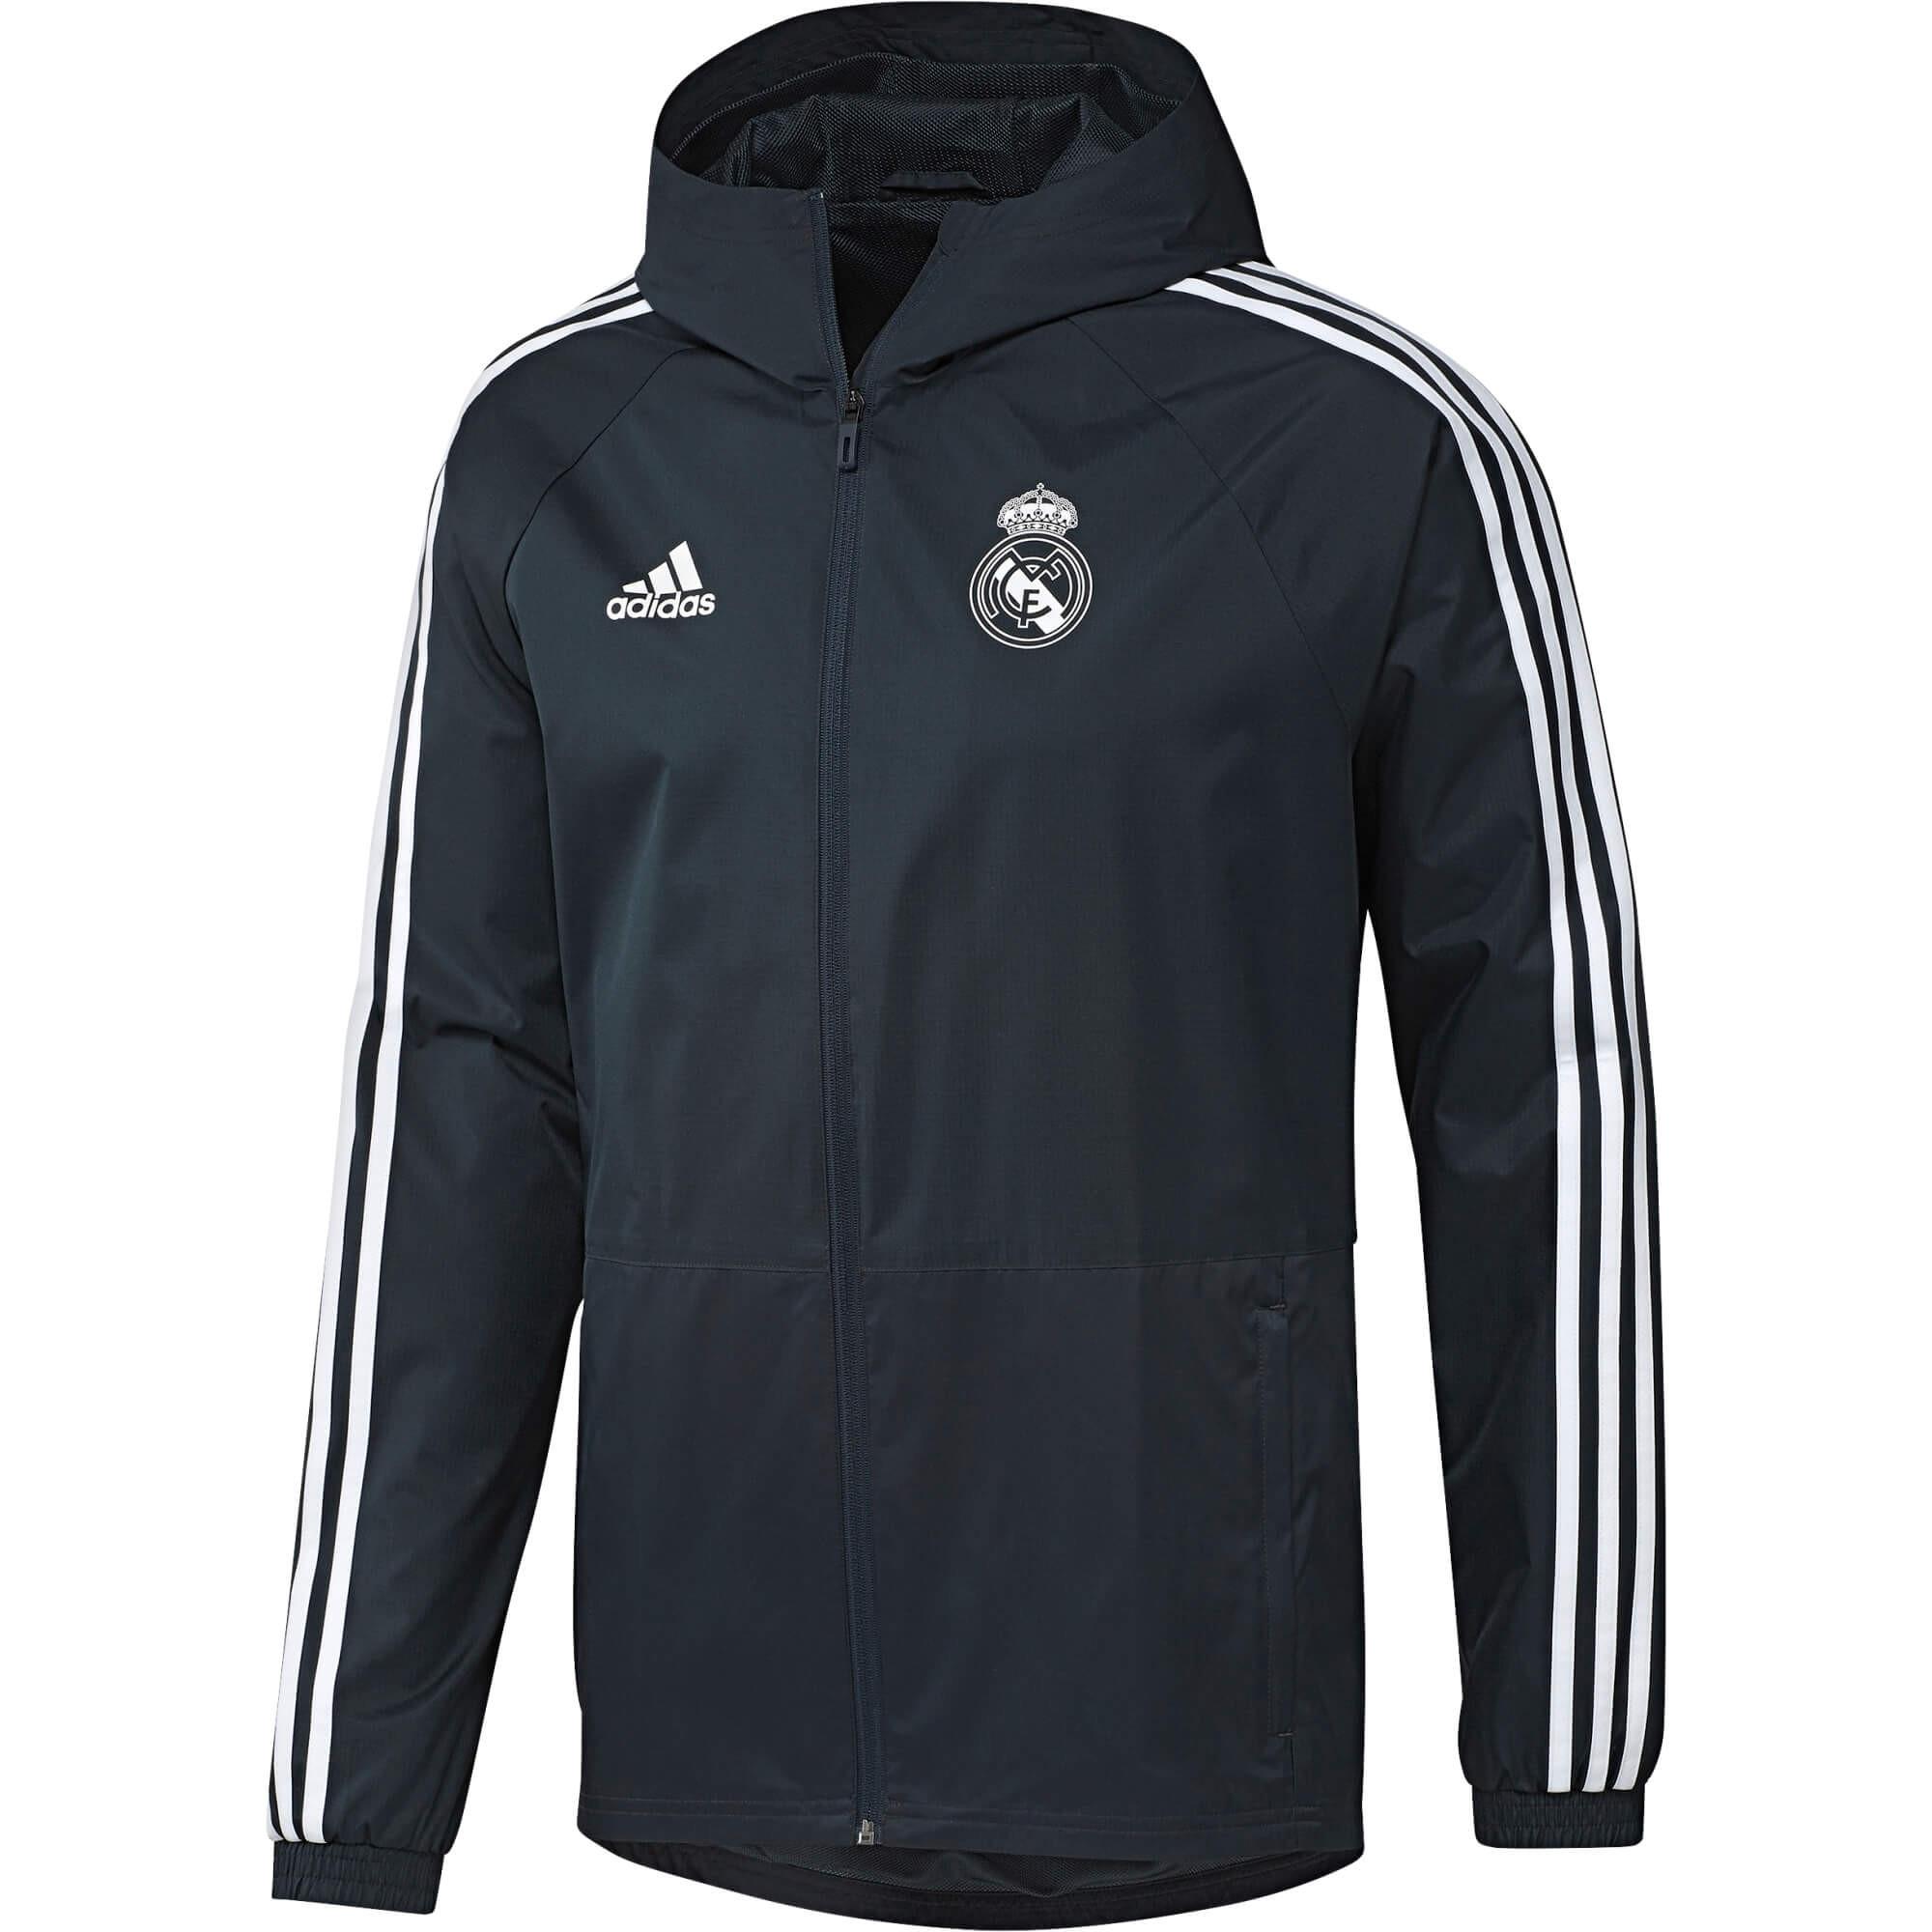 Veste Coupe Vent Adidas Real Madrid adulte 20182019 GrisBlanc